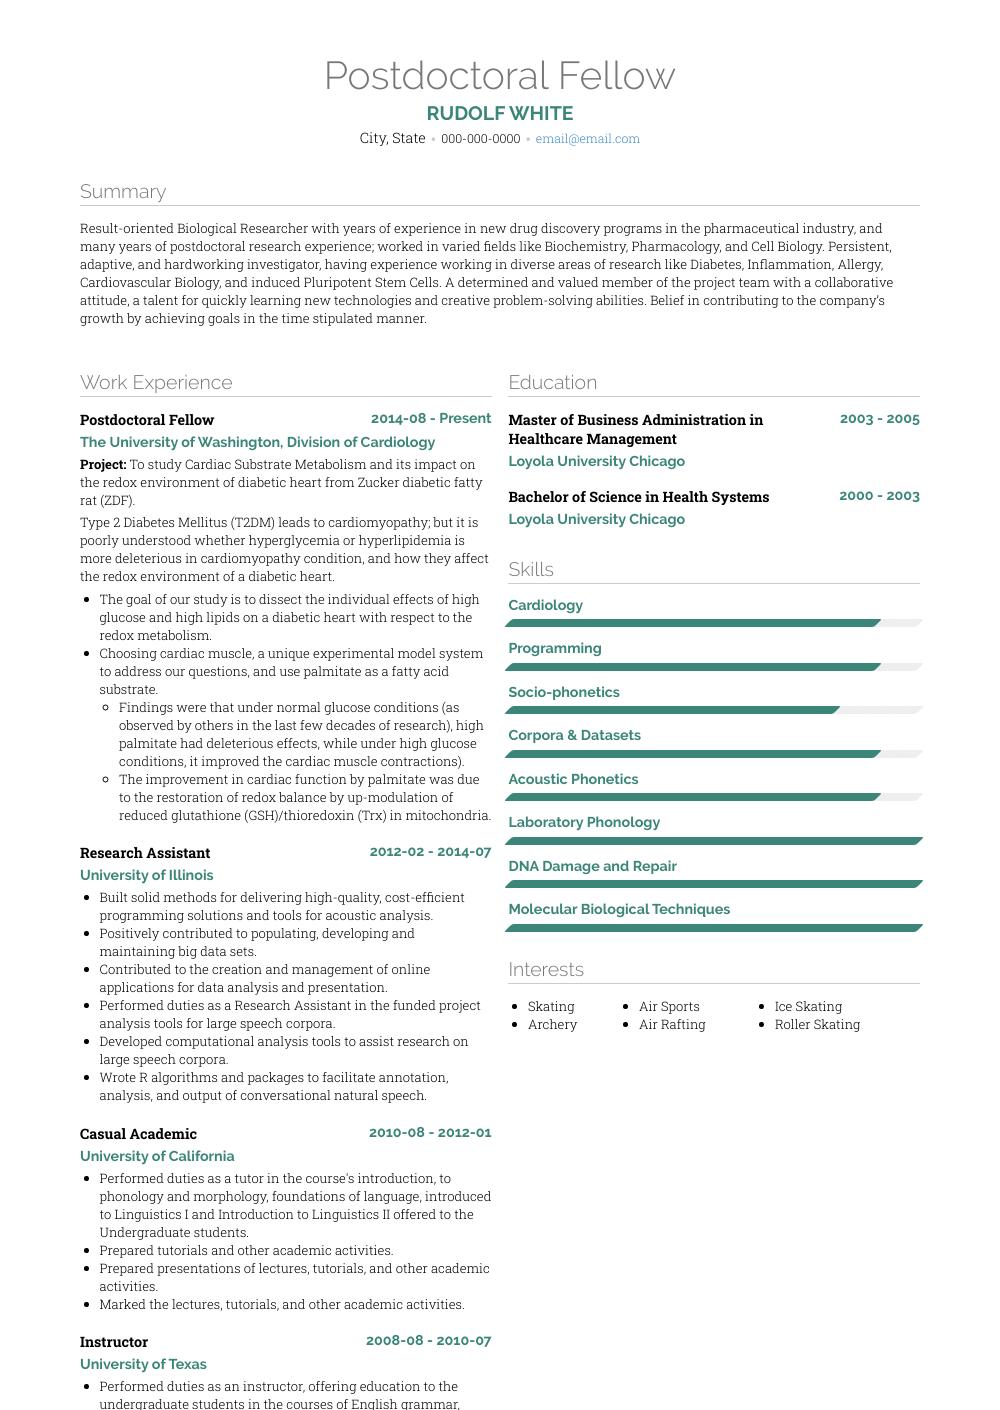 cv resume writing examples